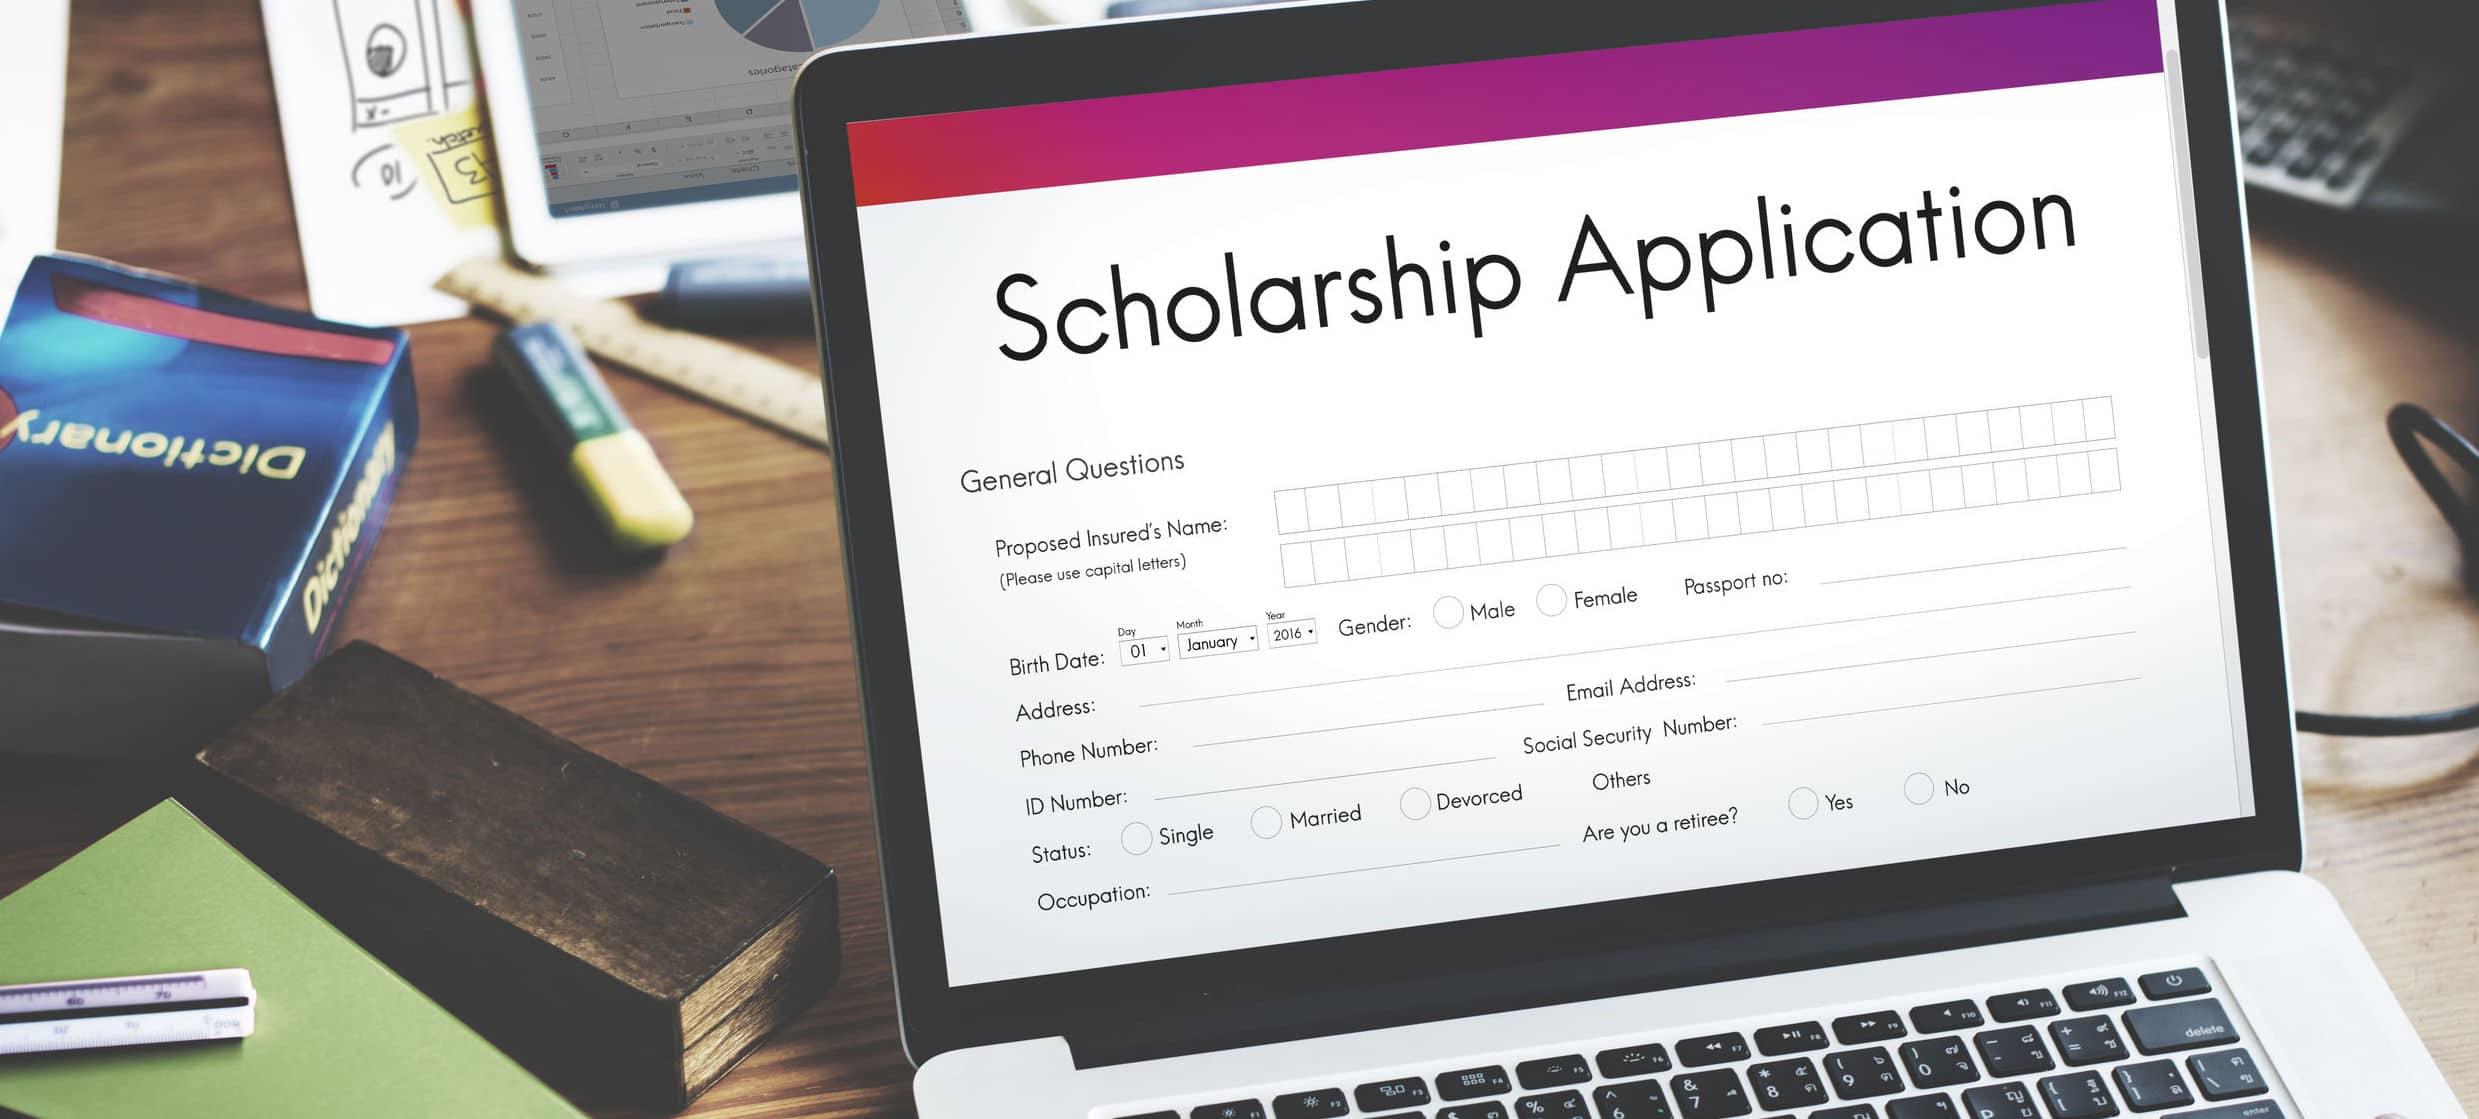 CLEAR Scoliosis Institute Announces Scholarship Recipients Image